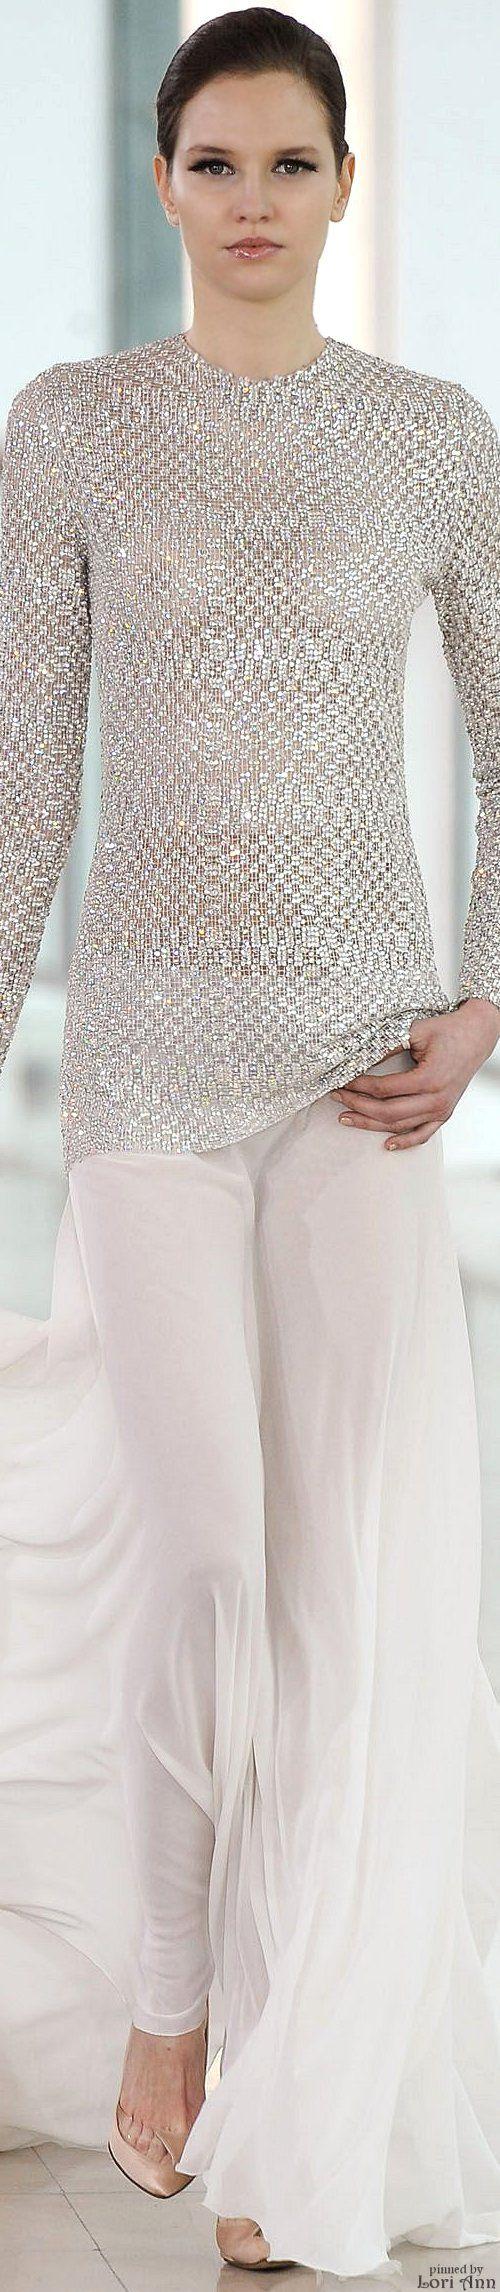 Stéphane Rolland ~ Couture White Metallic Long Sleeve Top w White Silk Skirt Spring 2015